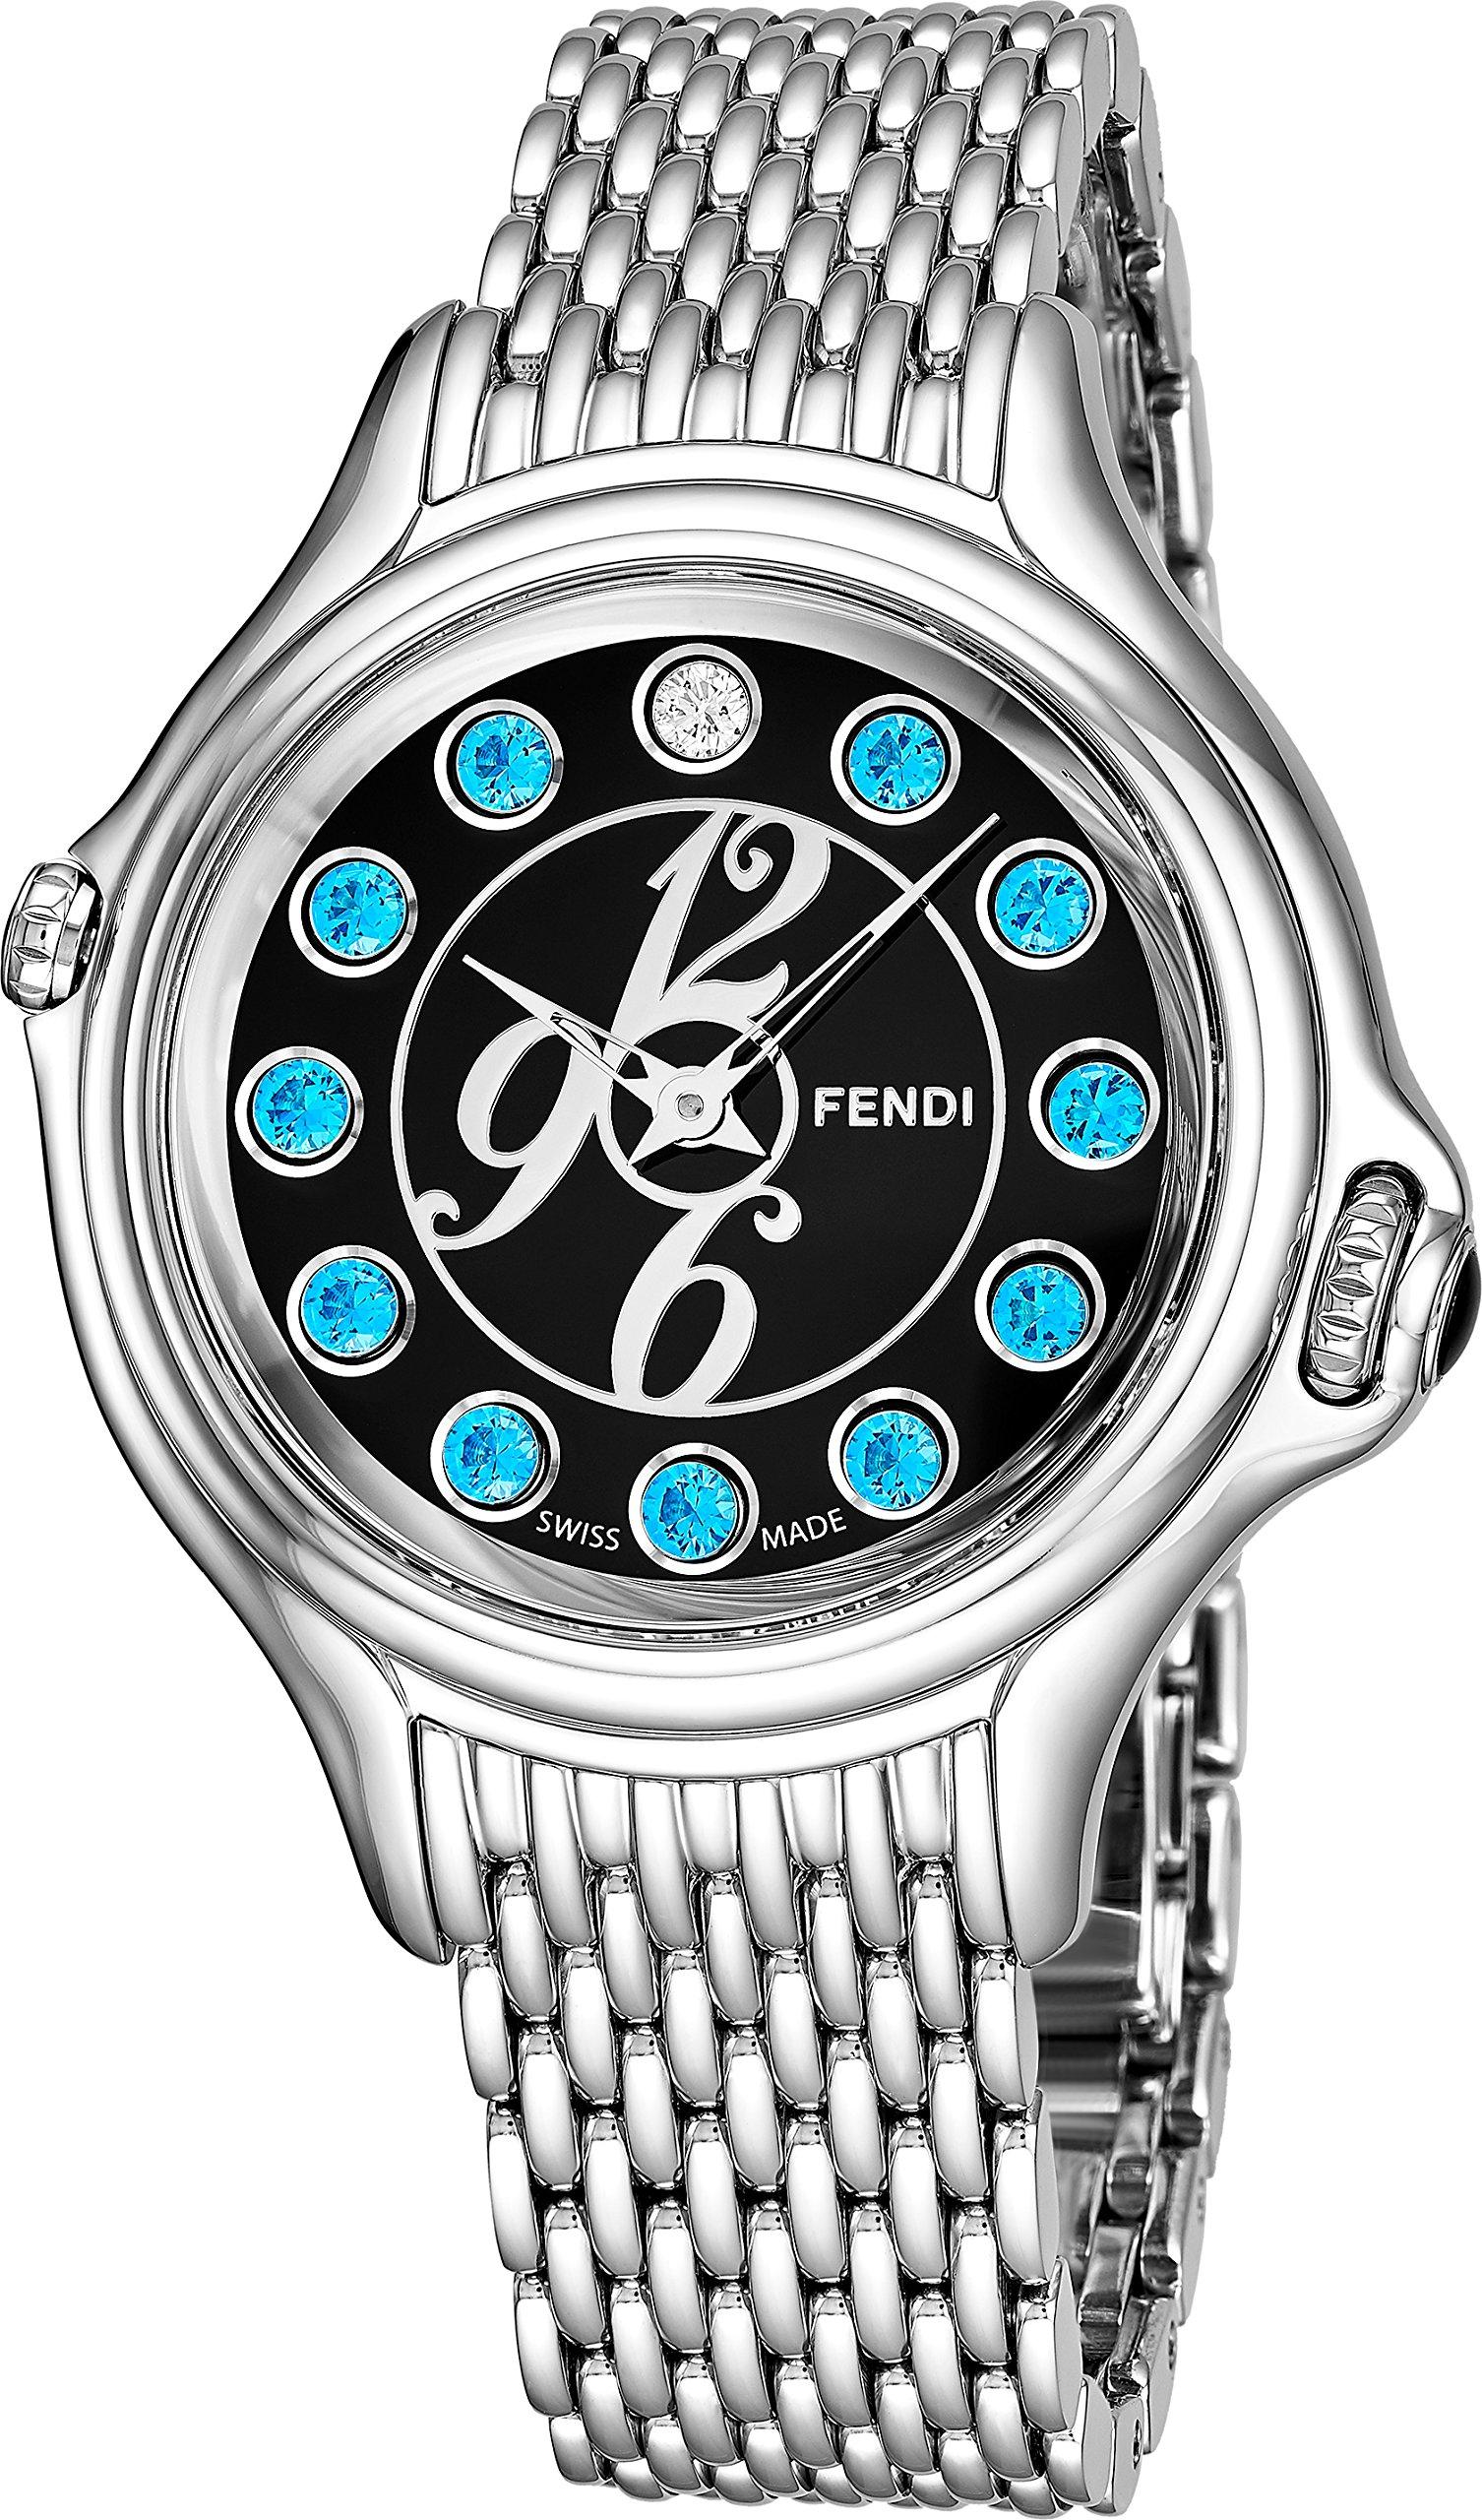 Fendi Crazy Carats Ladies Stainless Steel Luxury Watch - 38mm Black Face Multi Color Gemstones Analog Swiss Quartz Watch For Women F105031000T04